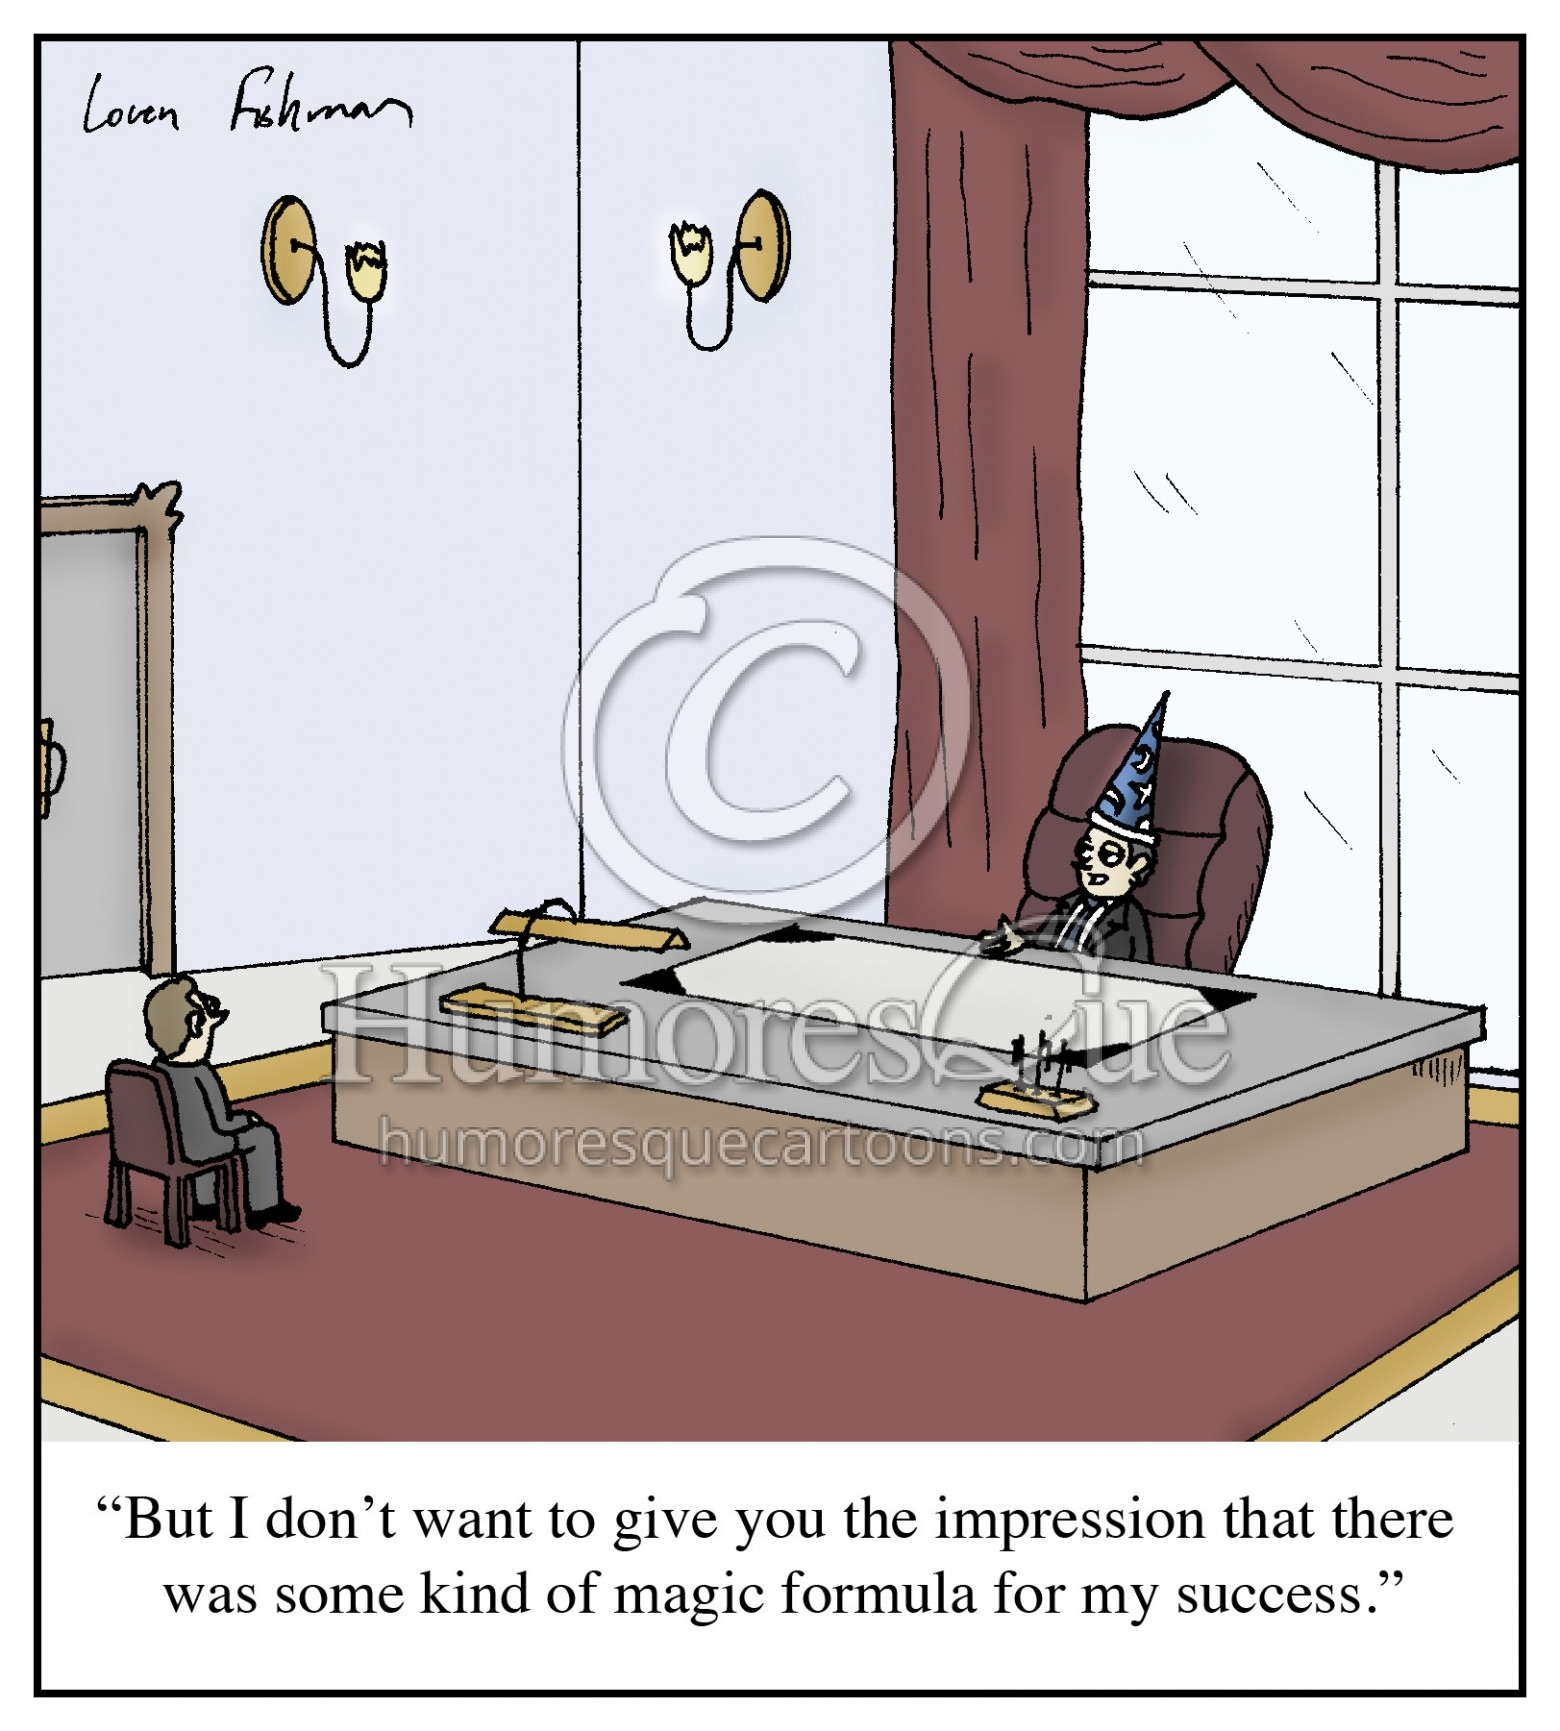 wizard hat ceo business formula success cartoon